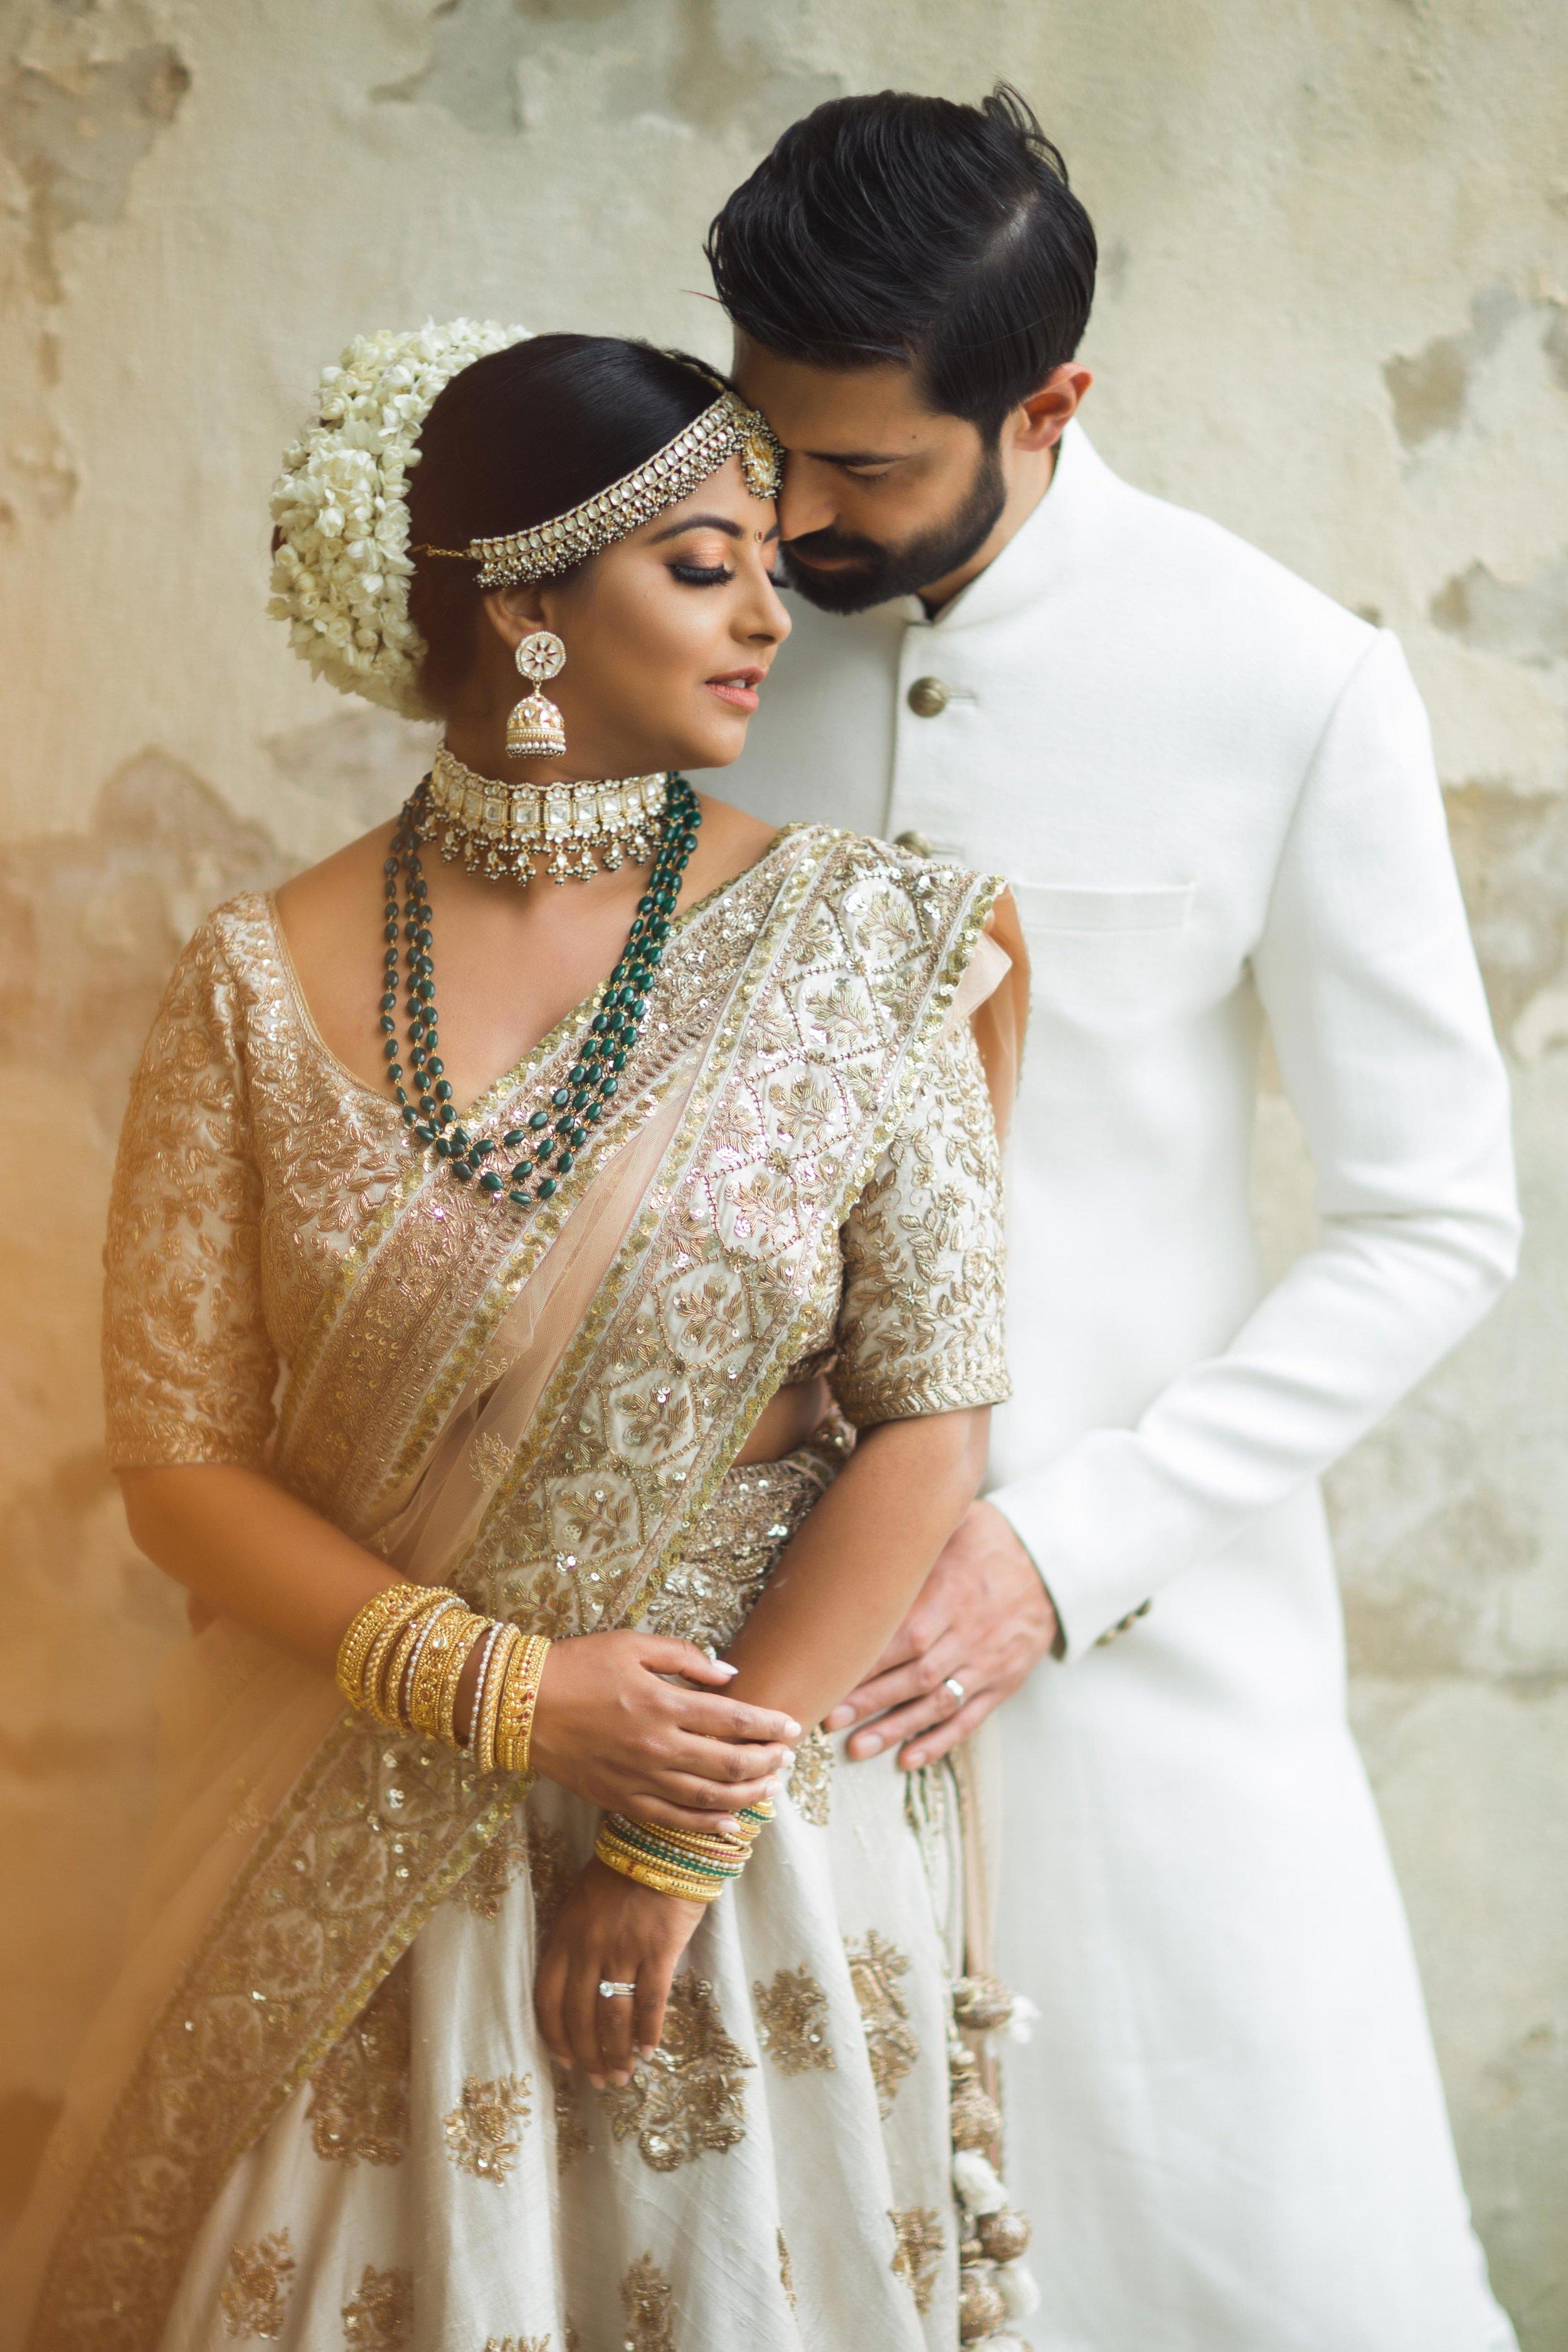 Zohaib Ali Indian Wedding Photographer 2.jpg